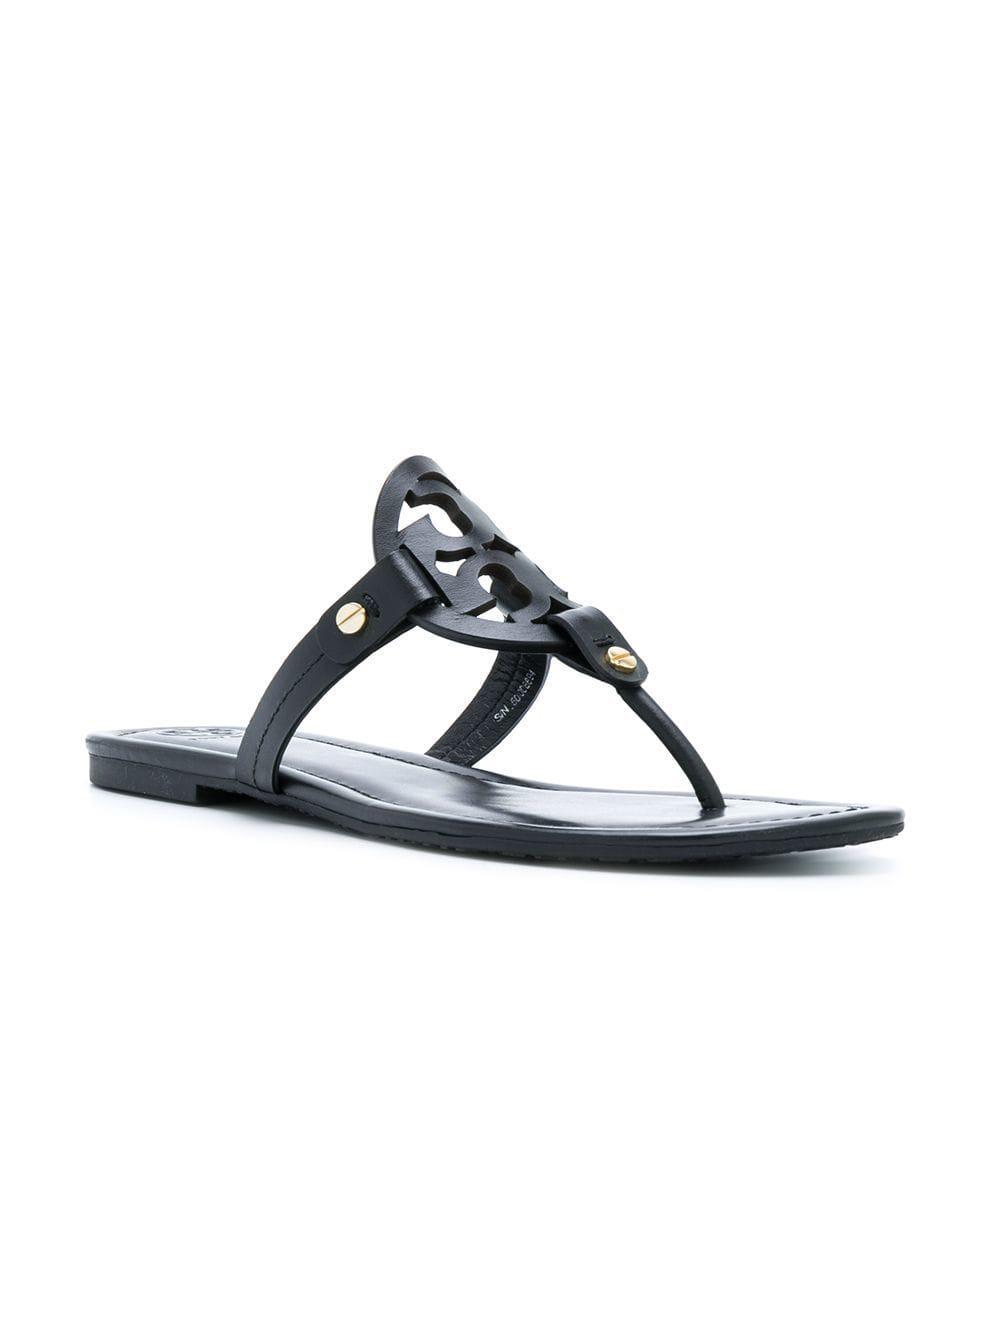 22a3c323515a11 Tory Burch - Black Miller Leather Sandals - Lyst. View fullscreen